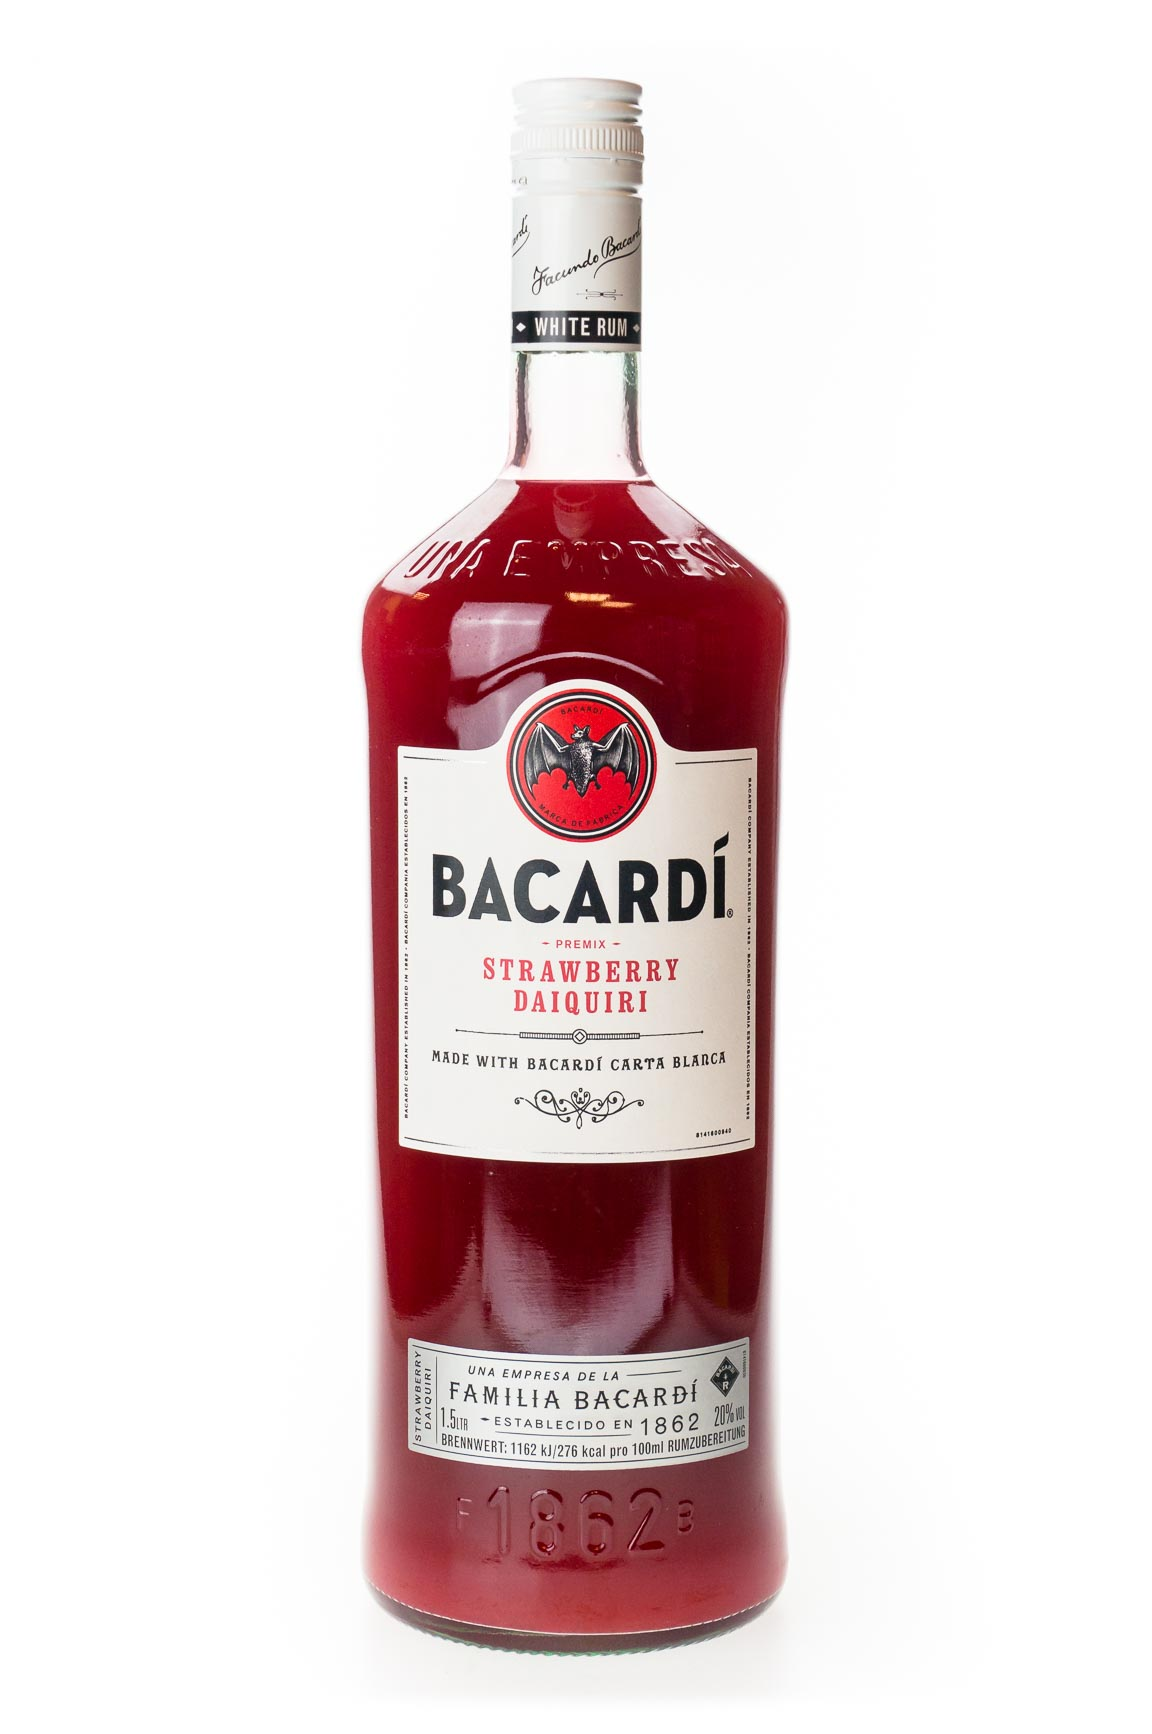 Bacardi Daiquiri Premix Strawberry kaufen ab 27,32 EUR im ...